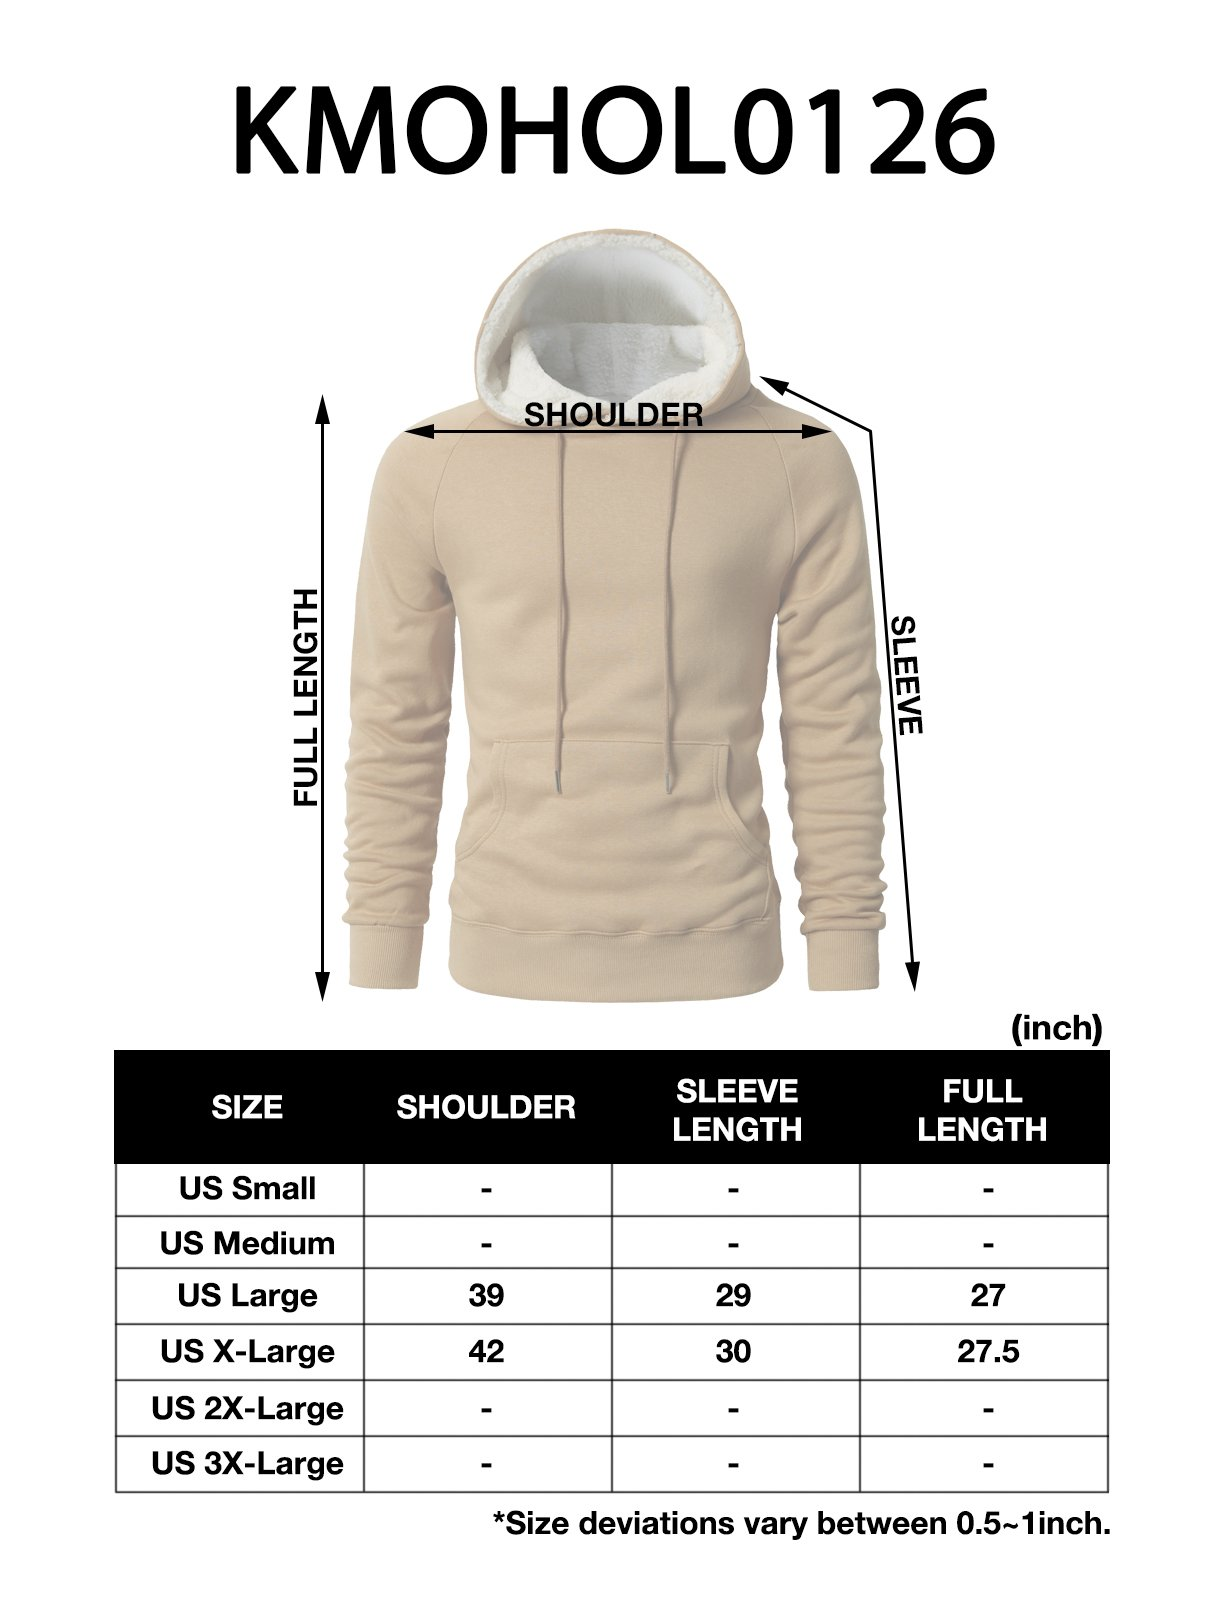 H2H Men's Fine Quality Plush Fleece Lined Pullover Beige US L/Asia XL (KMOHOL0126) by H2H (Image #6)